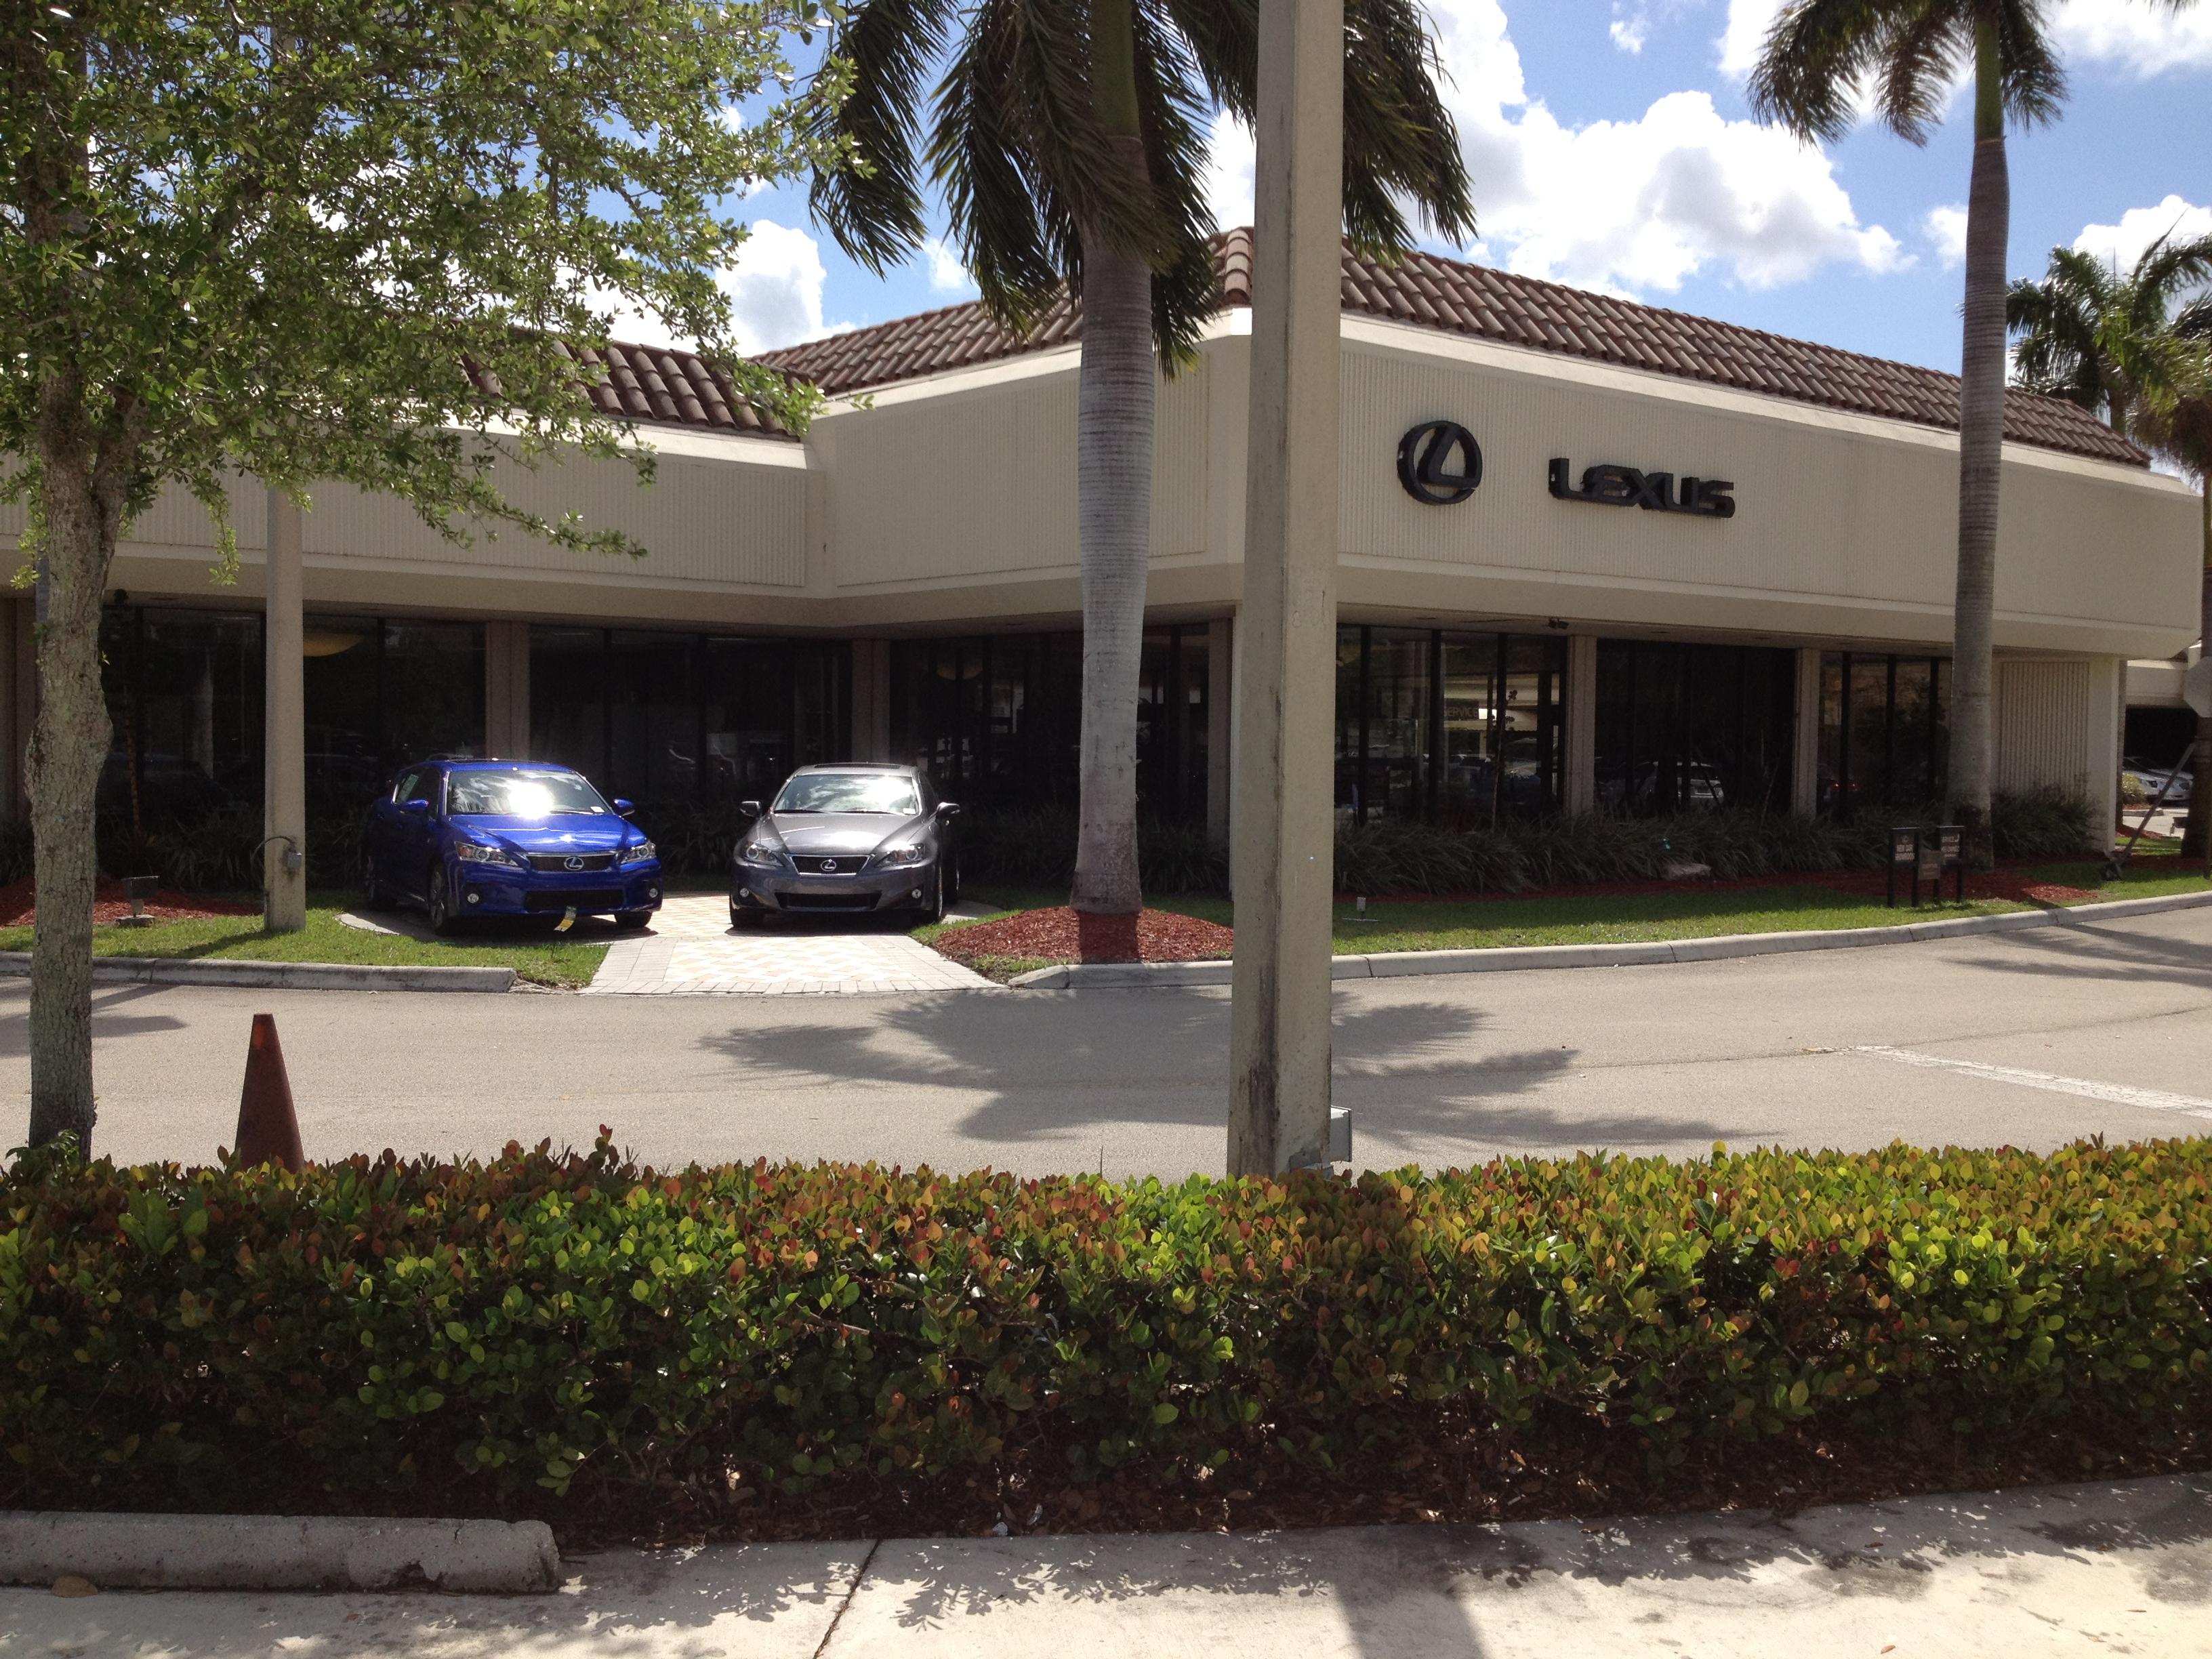 Lexus of Pembroke Pines in Pembroke Pines, FL | Whitepages